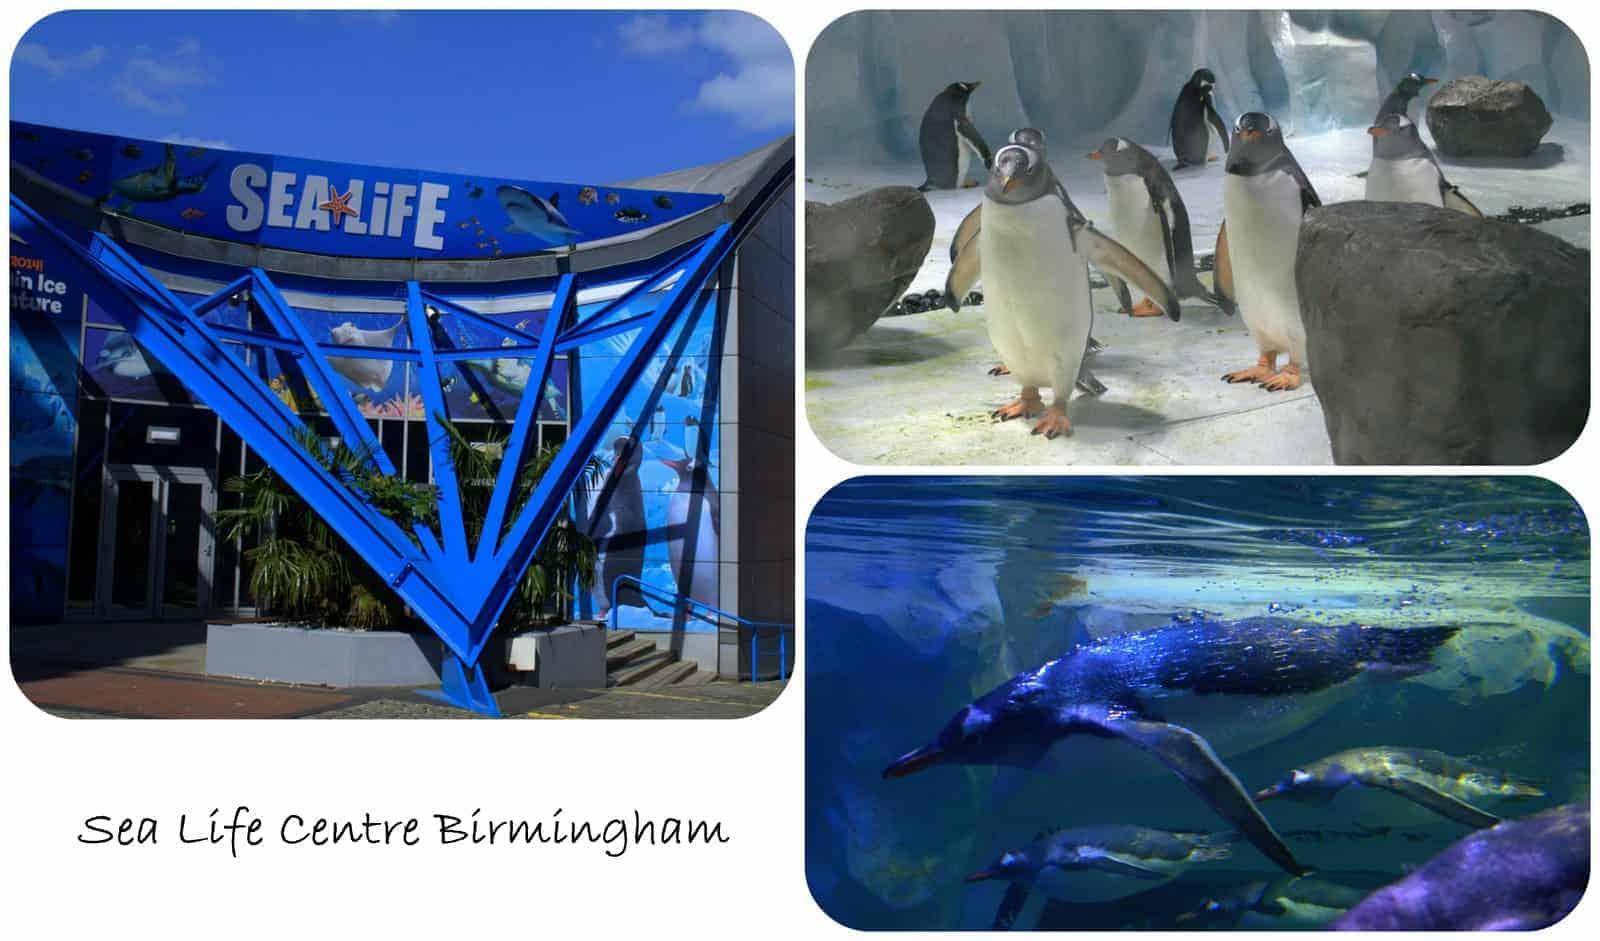 Easter Holidays – Day 8 – Sea Life Birmingham